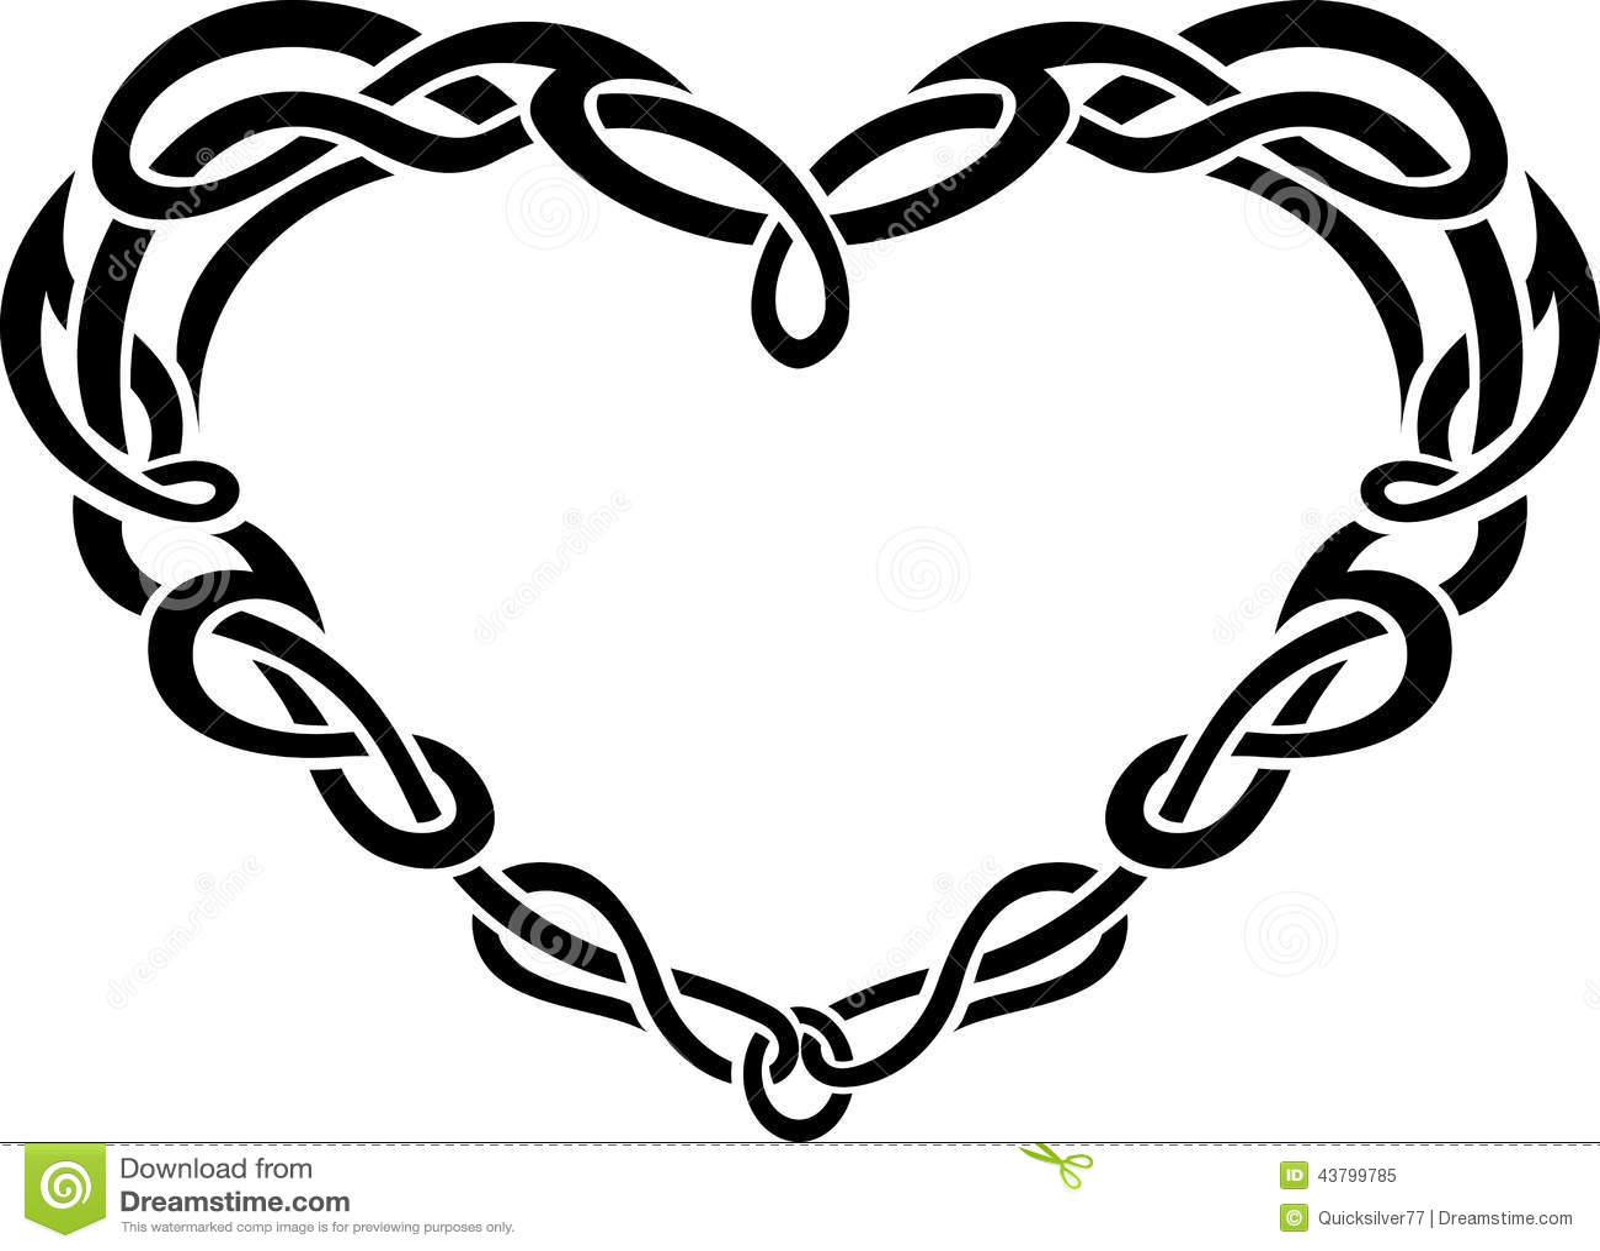 Celtic Heart Border Stock Illustration Illustration Of